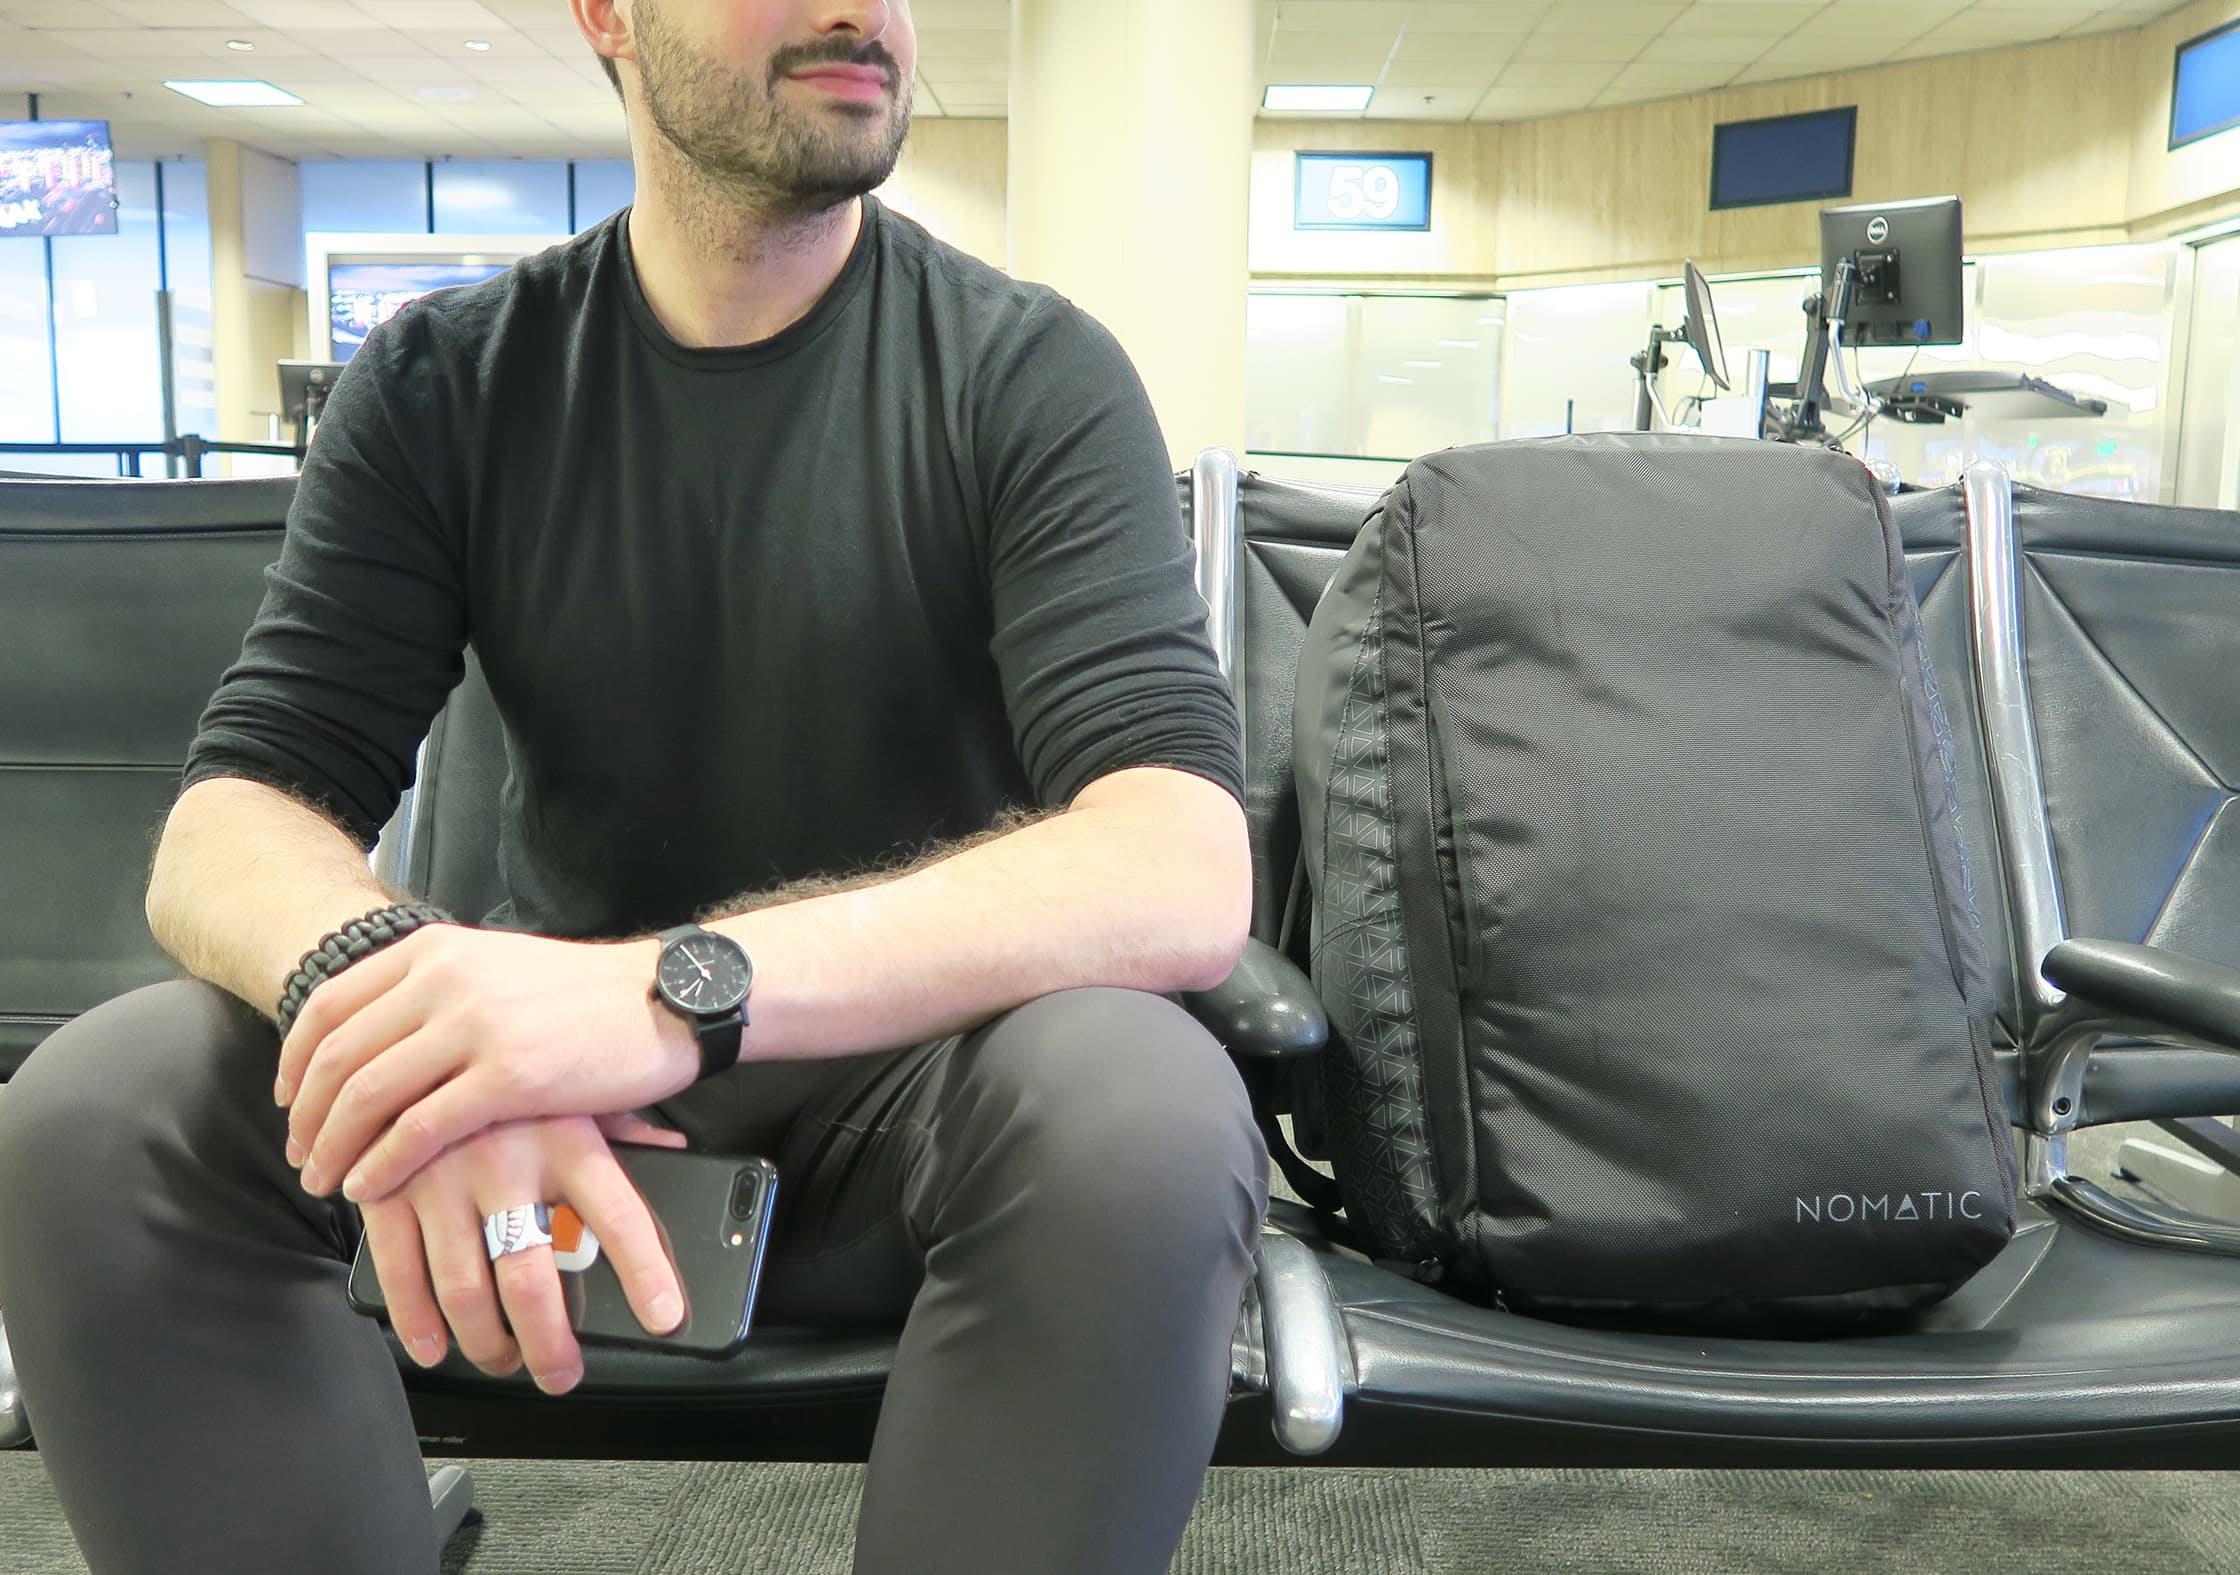 NOMATIC Travel Bag At Airport